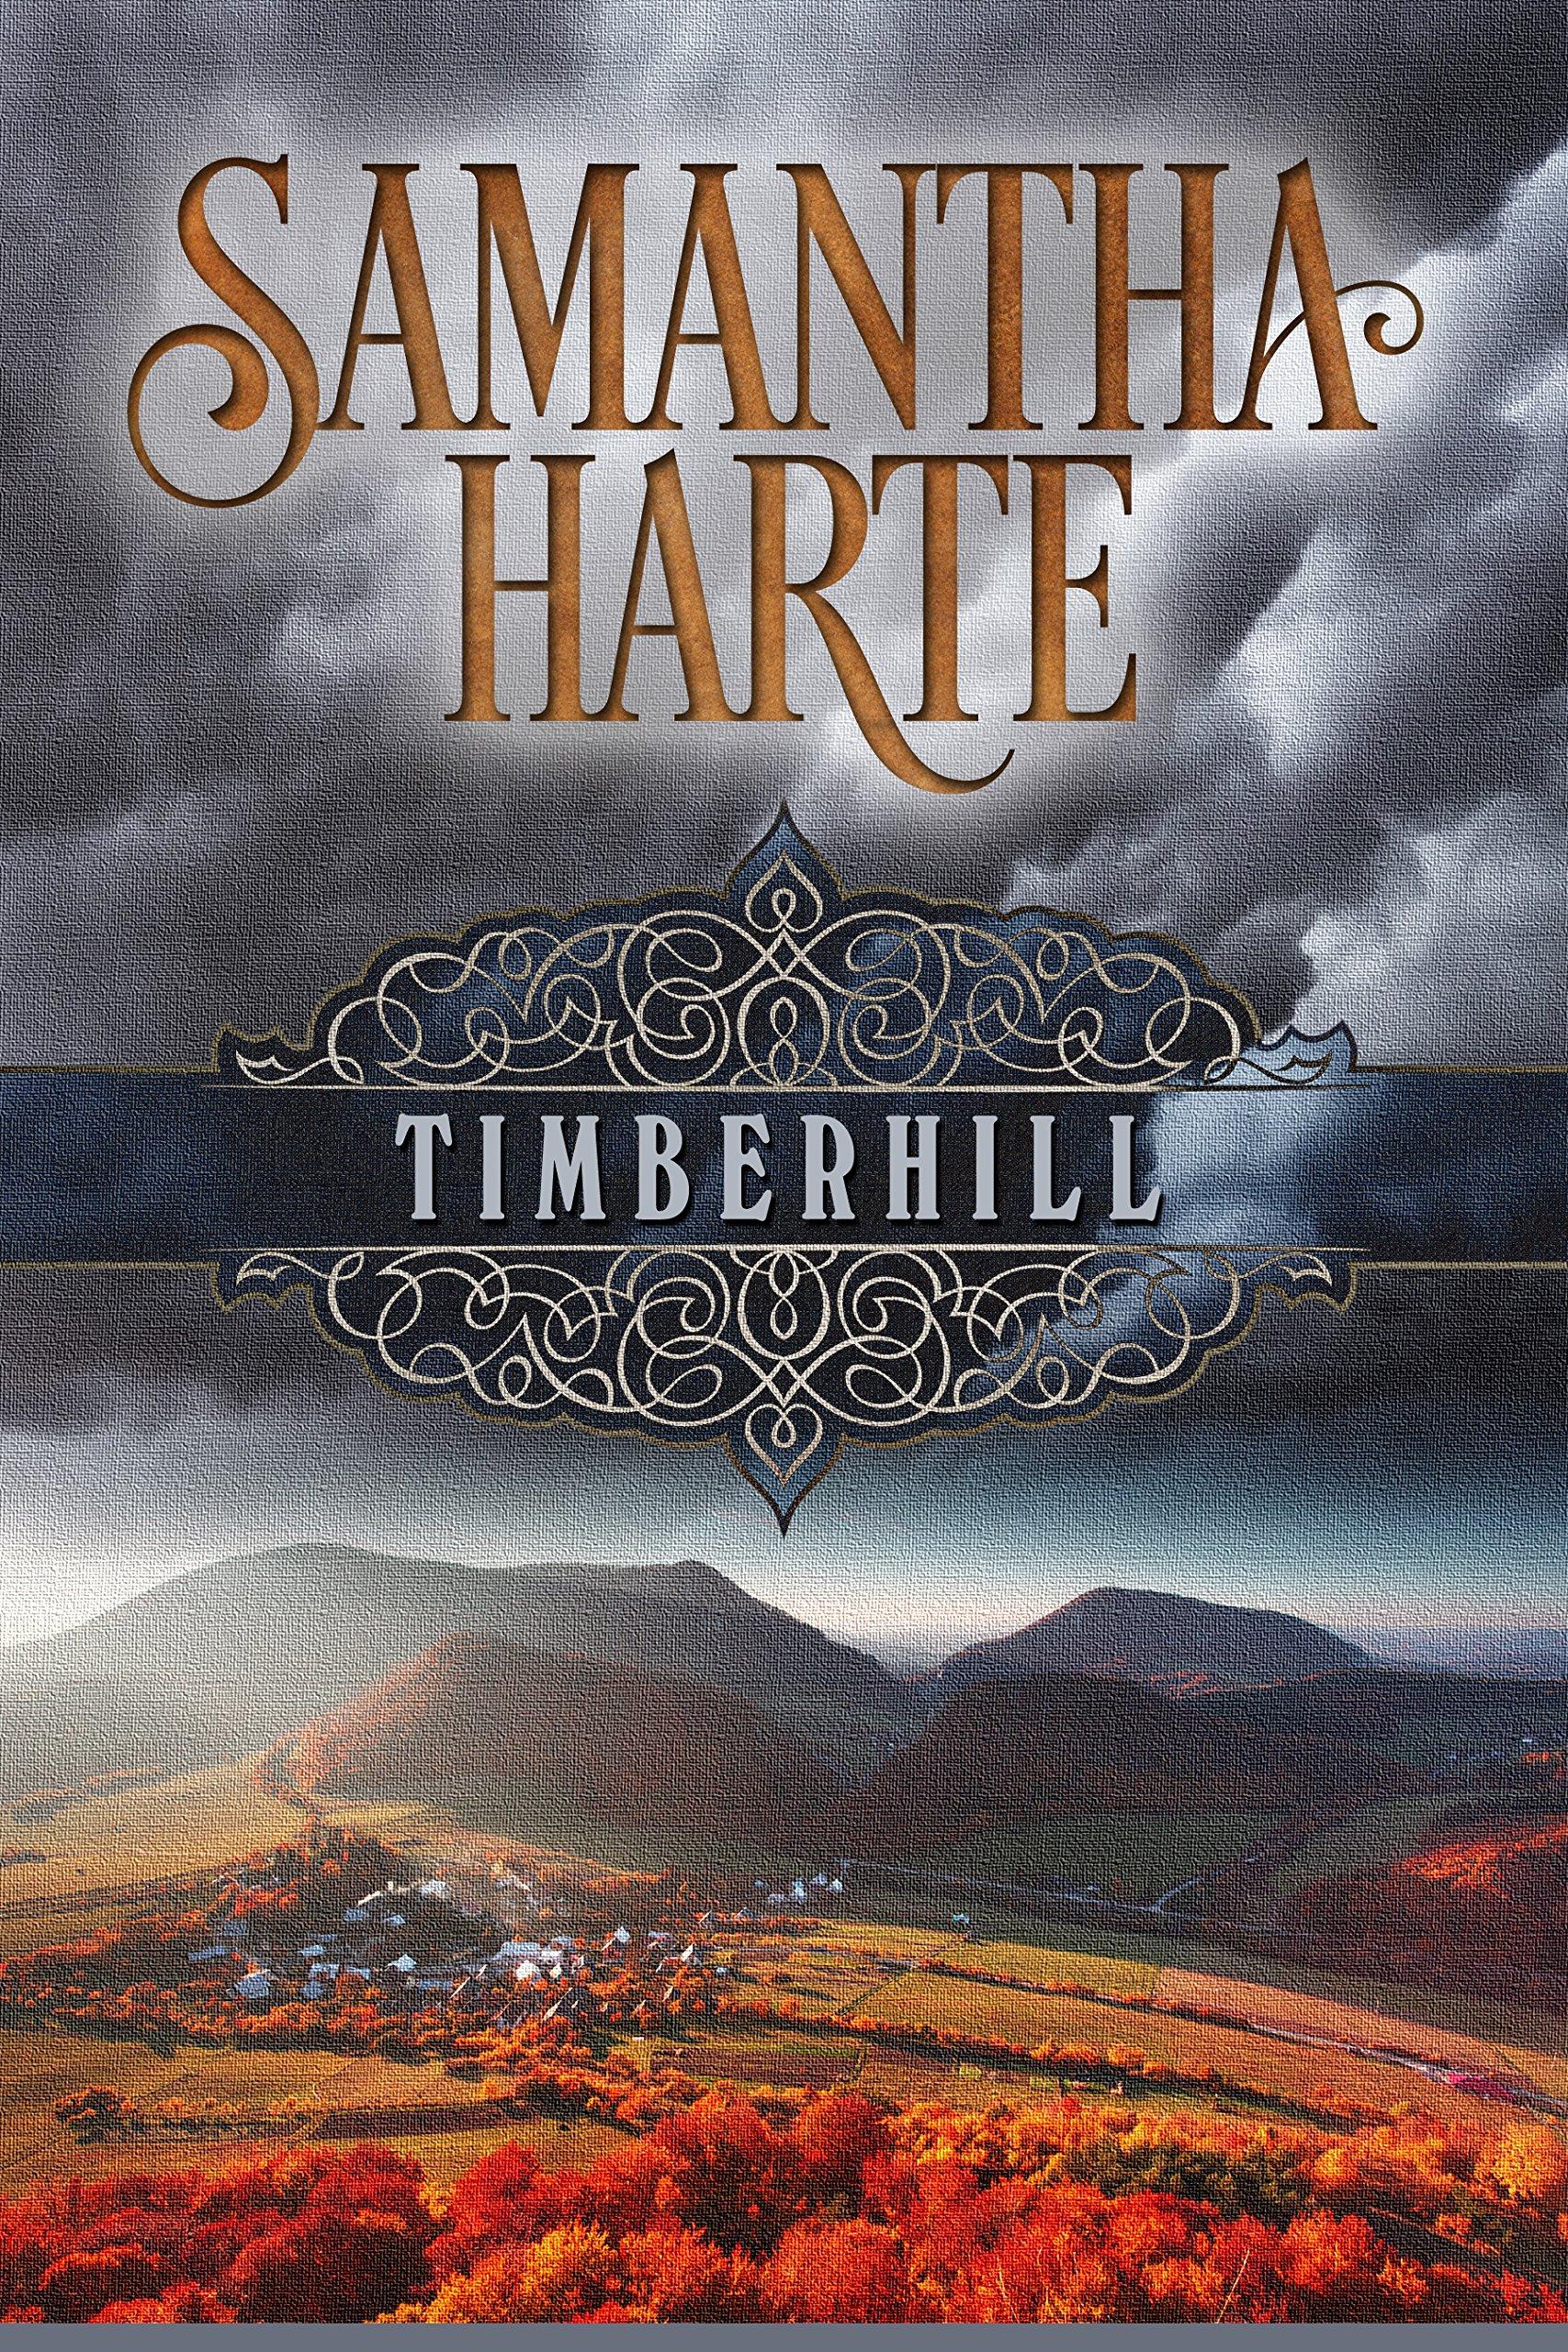 Timberhill